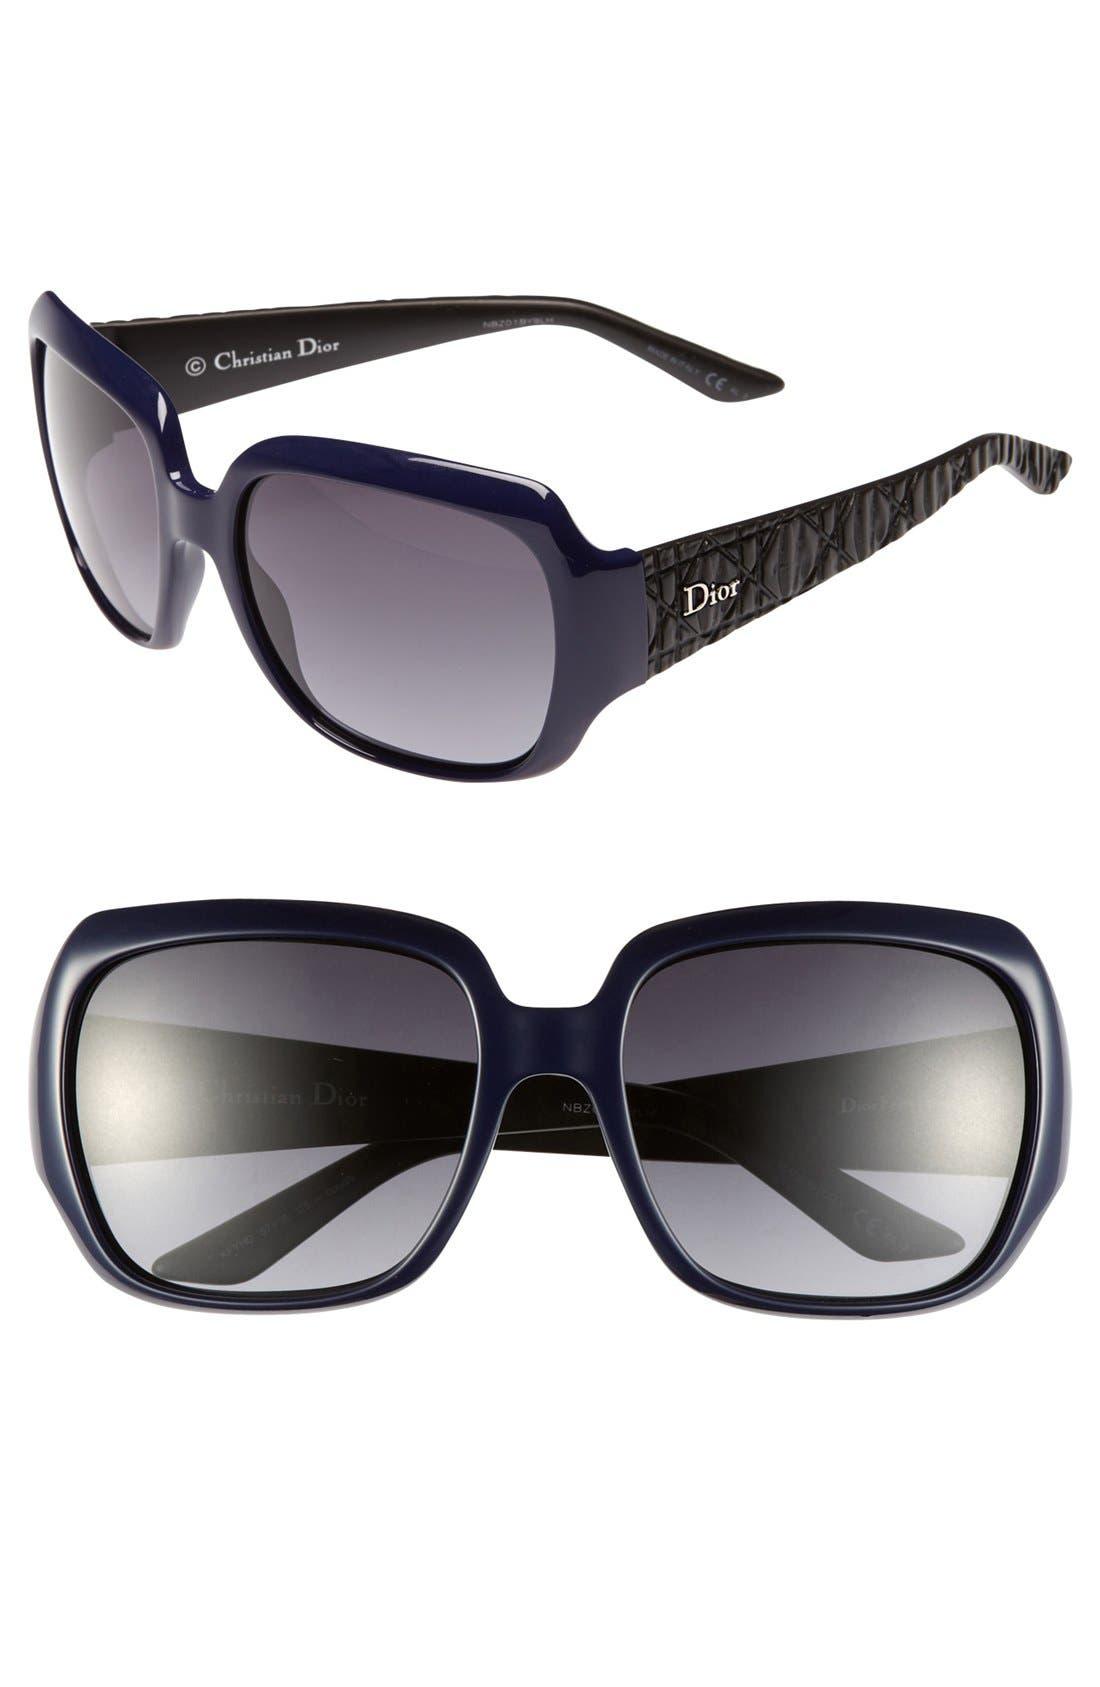 Main Image - Dior 'Classic' 57mm Sunglasses